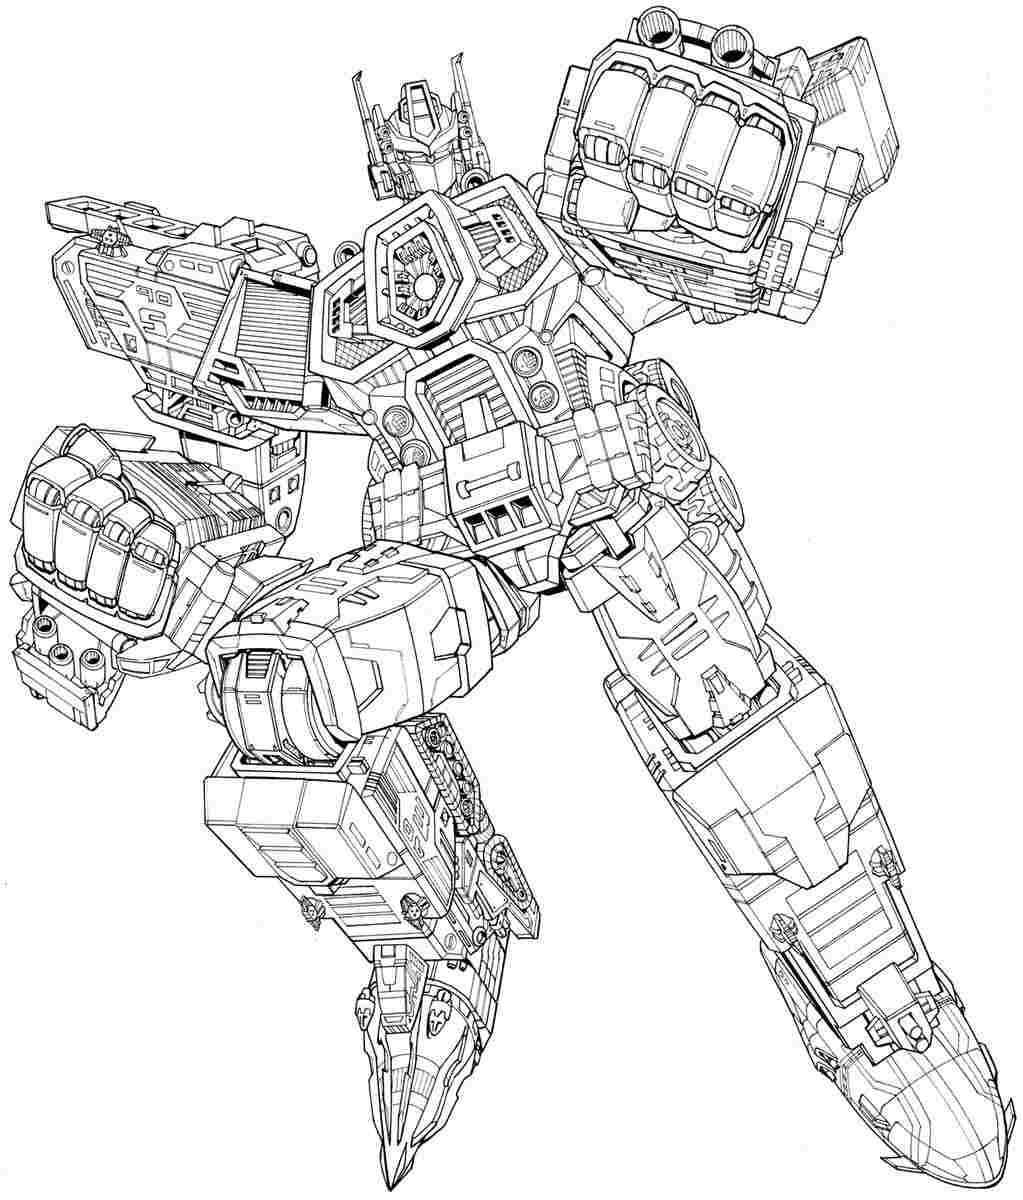 Transformers Printable Coloring Pages Printable Free Coloring Pages The Transformers Movie For Girls Boys Detskie Raskraski Raskraski Detskie